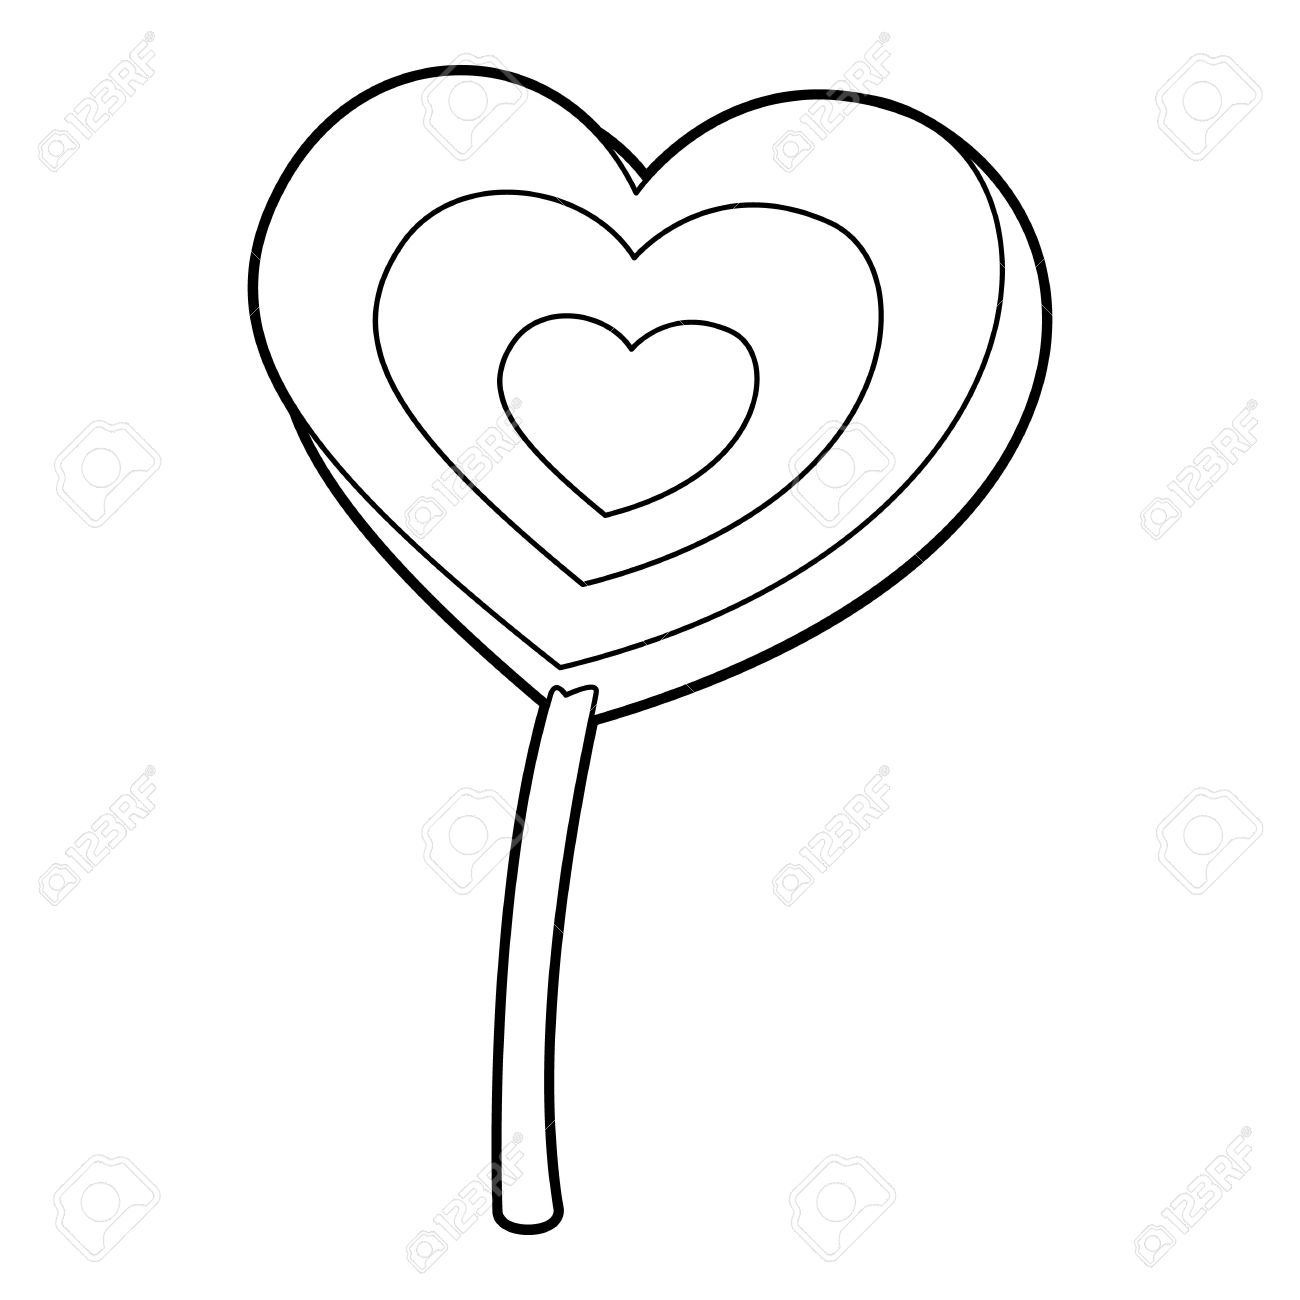 1300x1300 Lollipop Heart Icon. Outline Illustration Of Lollipop Heart Vector